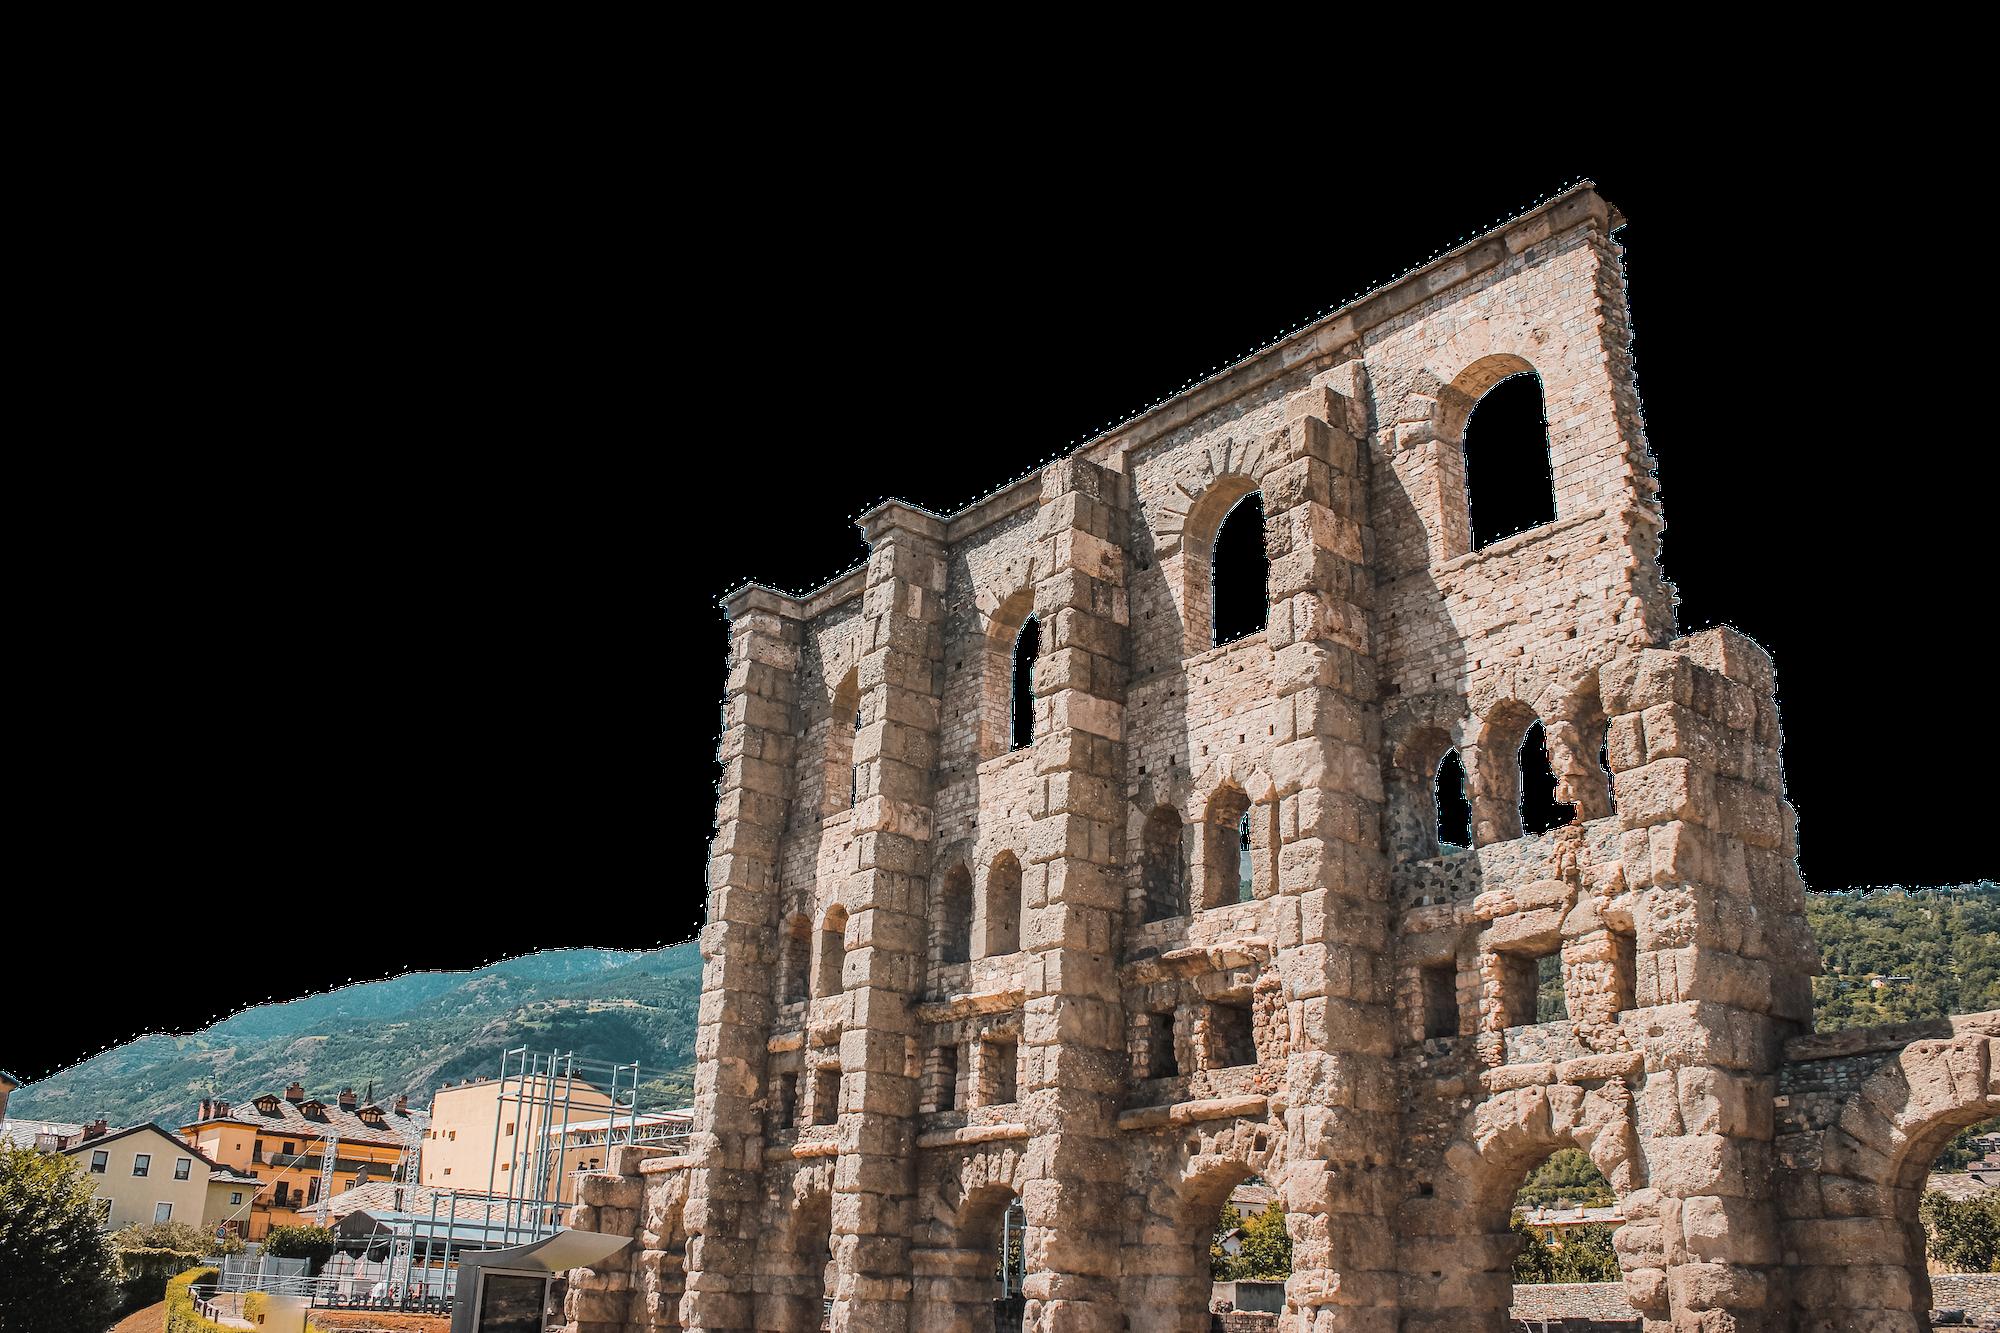 aosta-tal römische ruinen tour